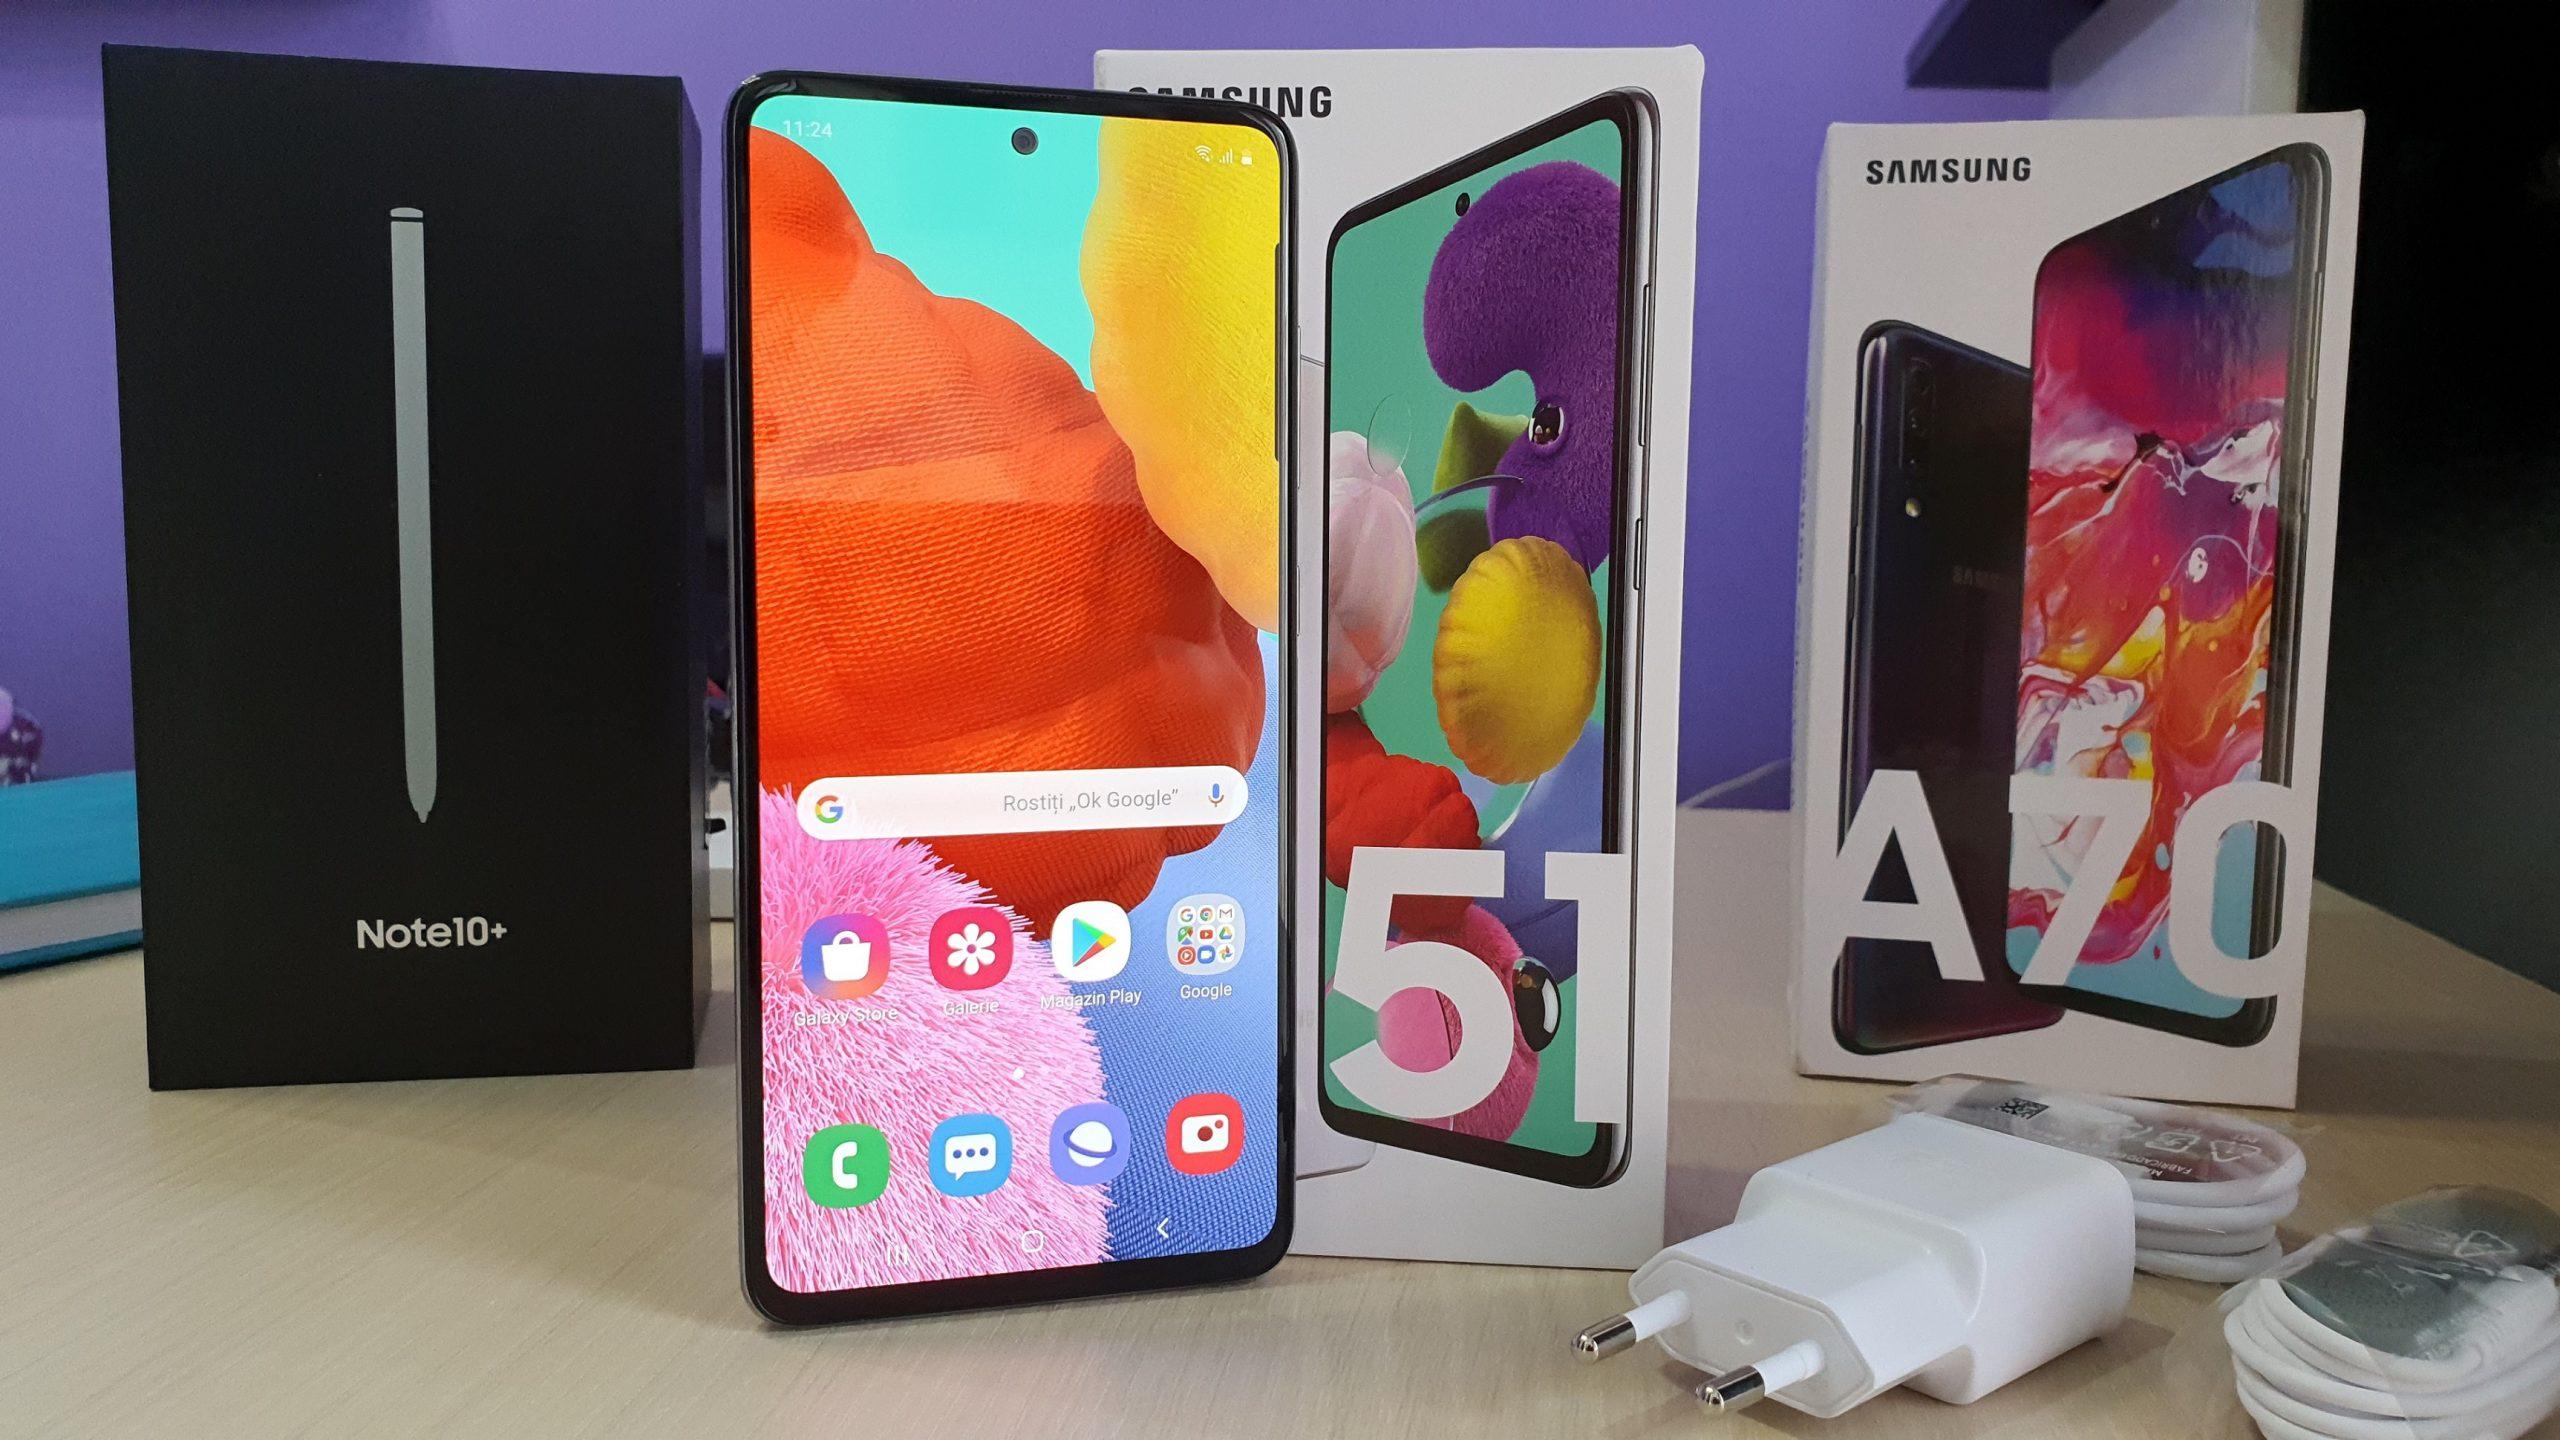 Care sunt avantajele telefoanelor Samsung?